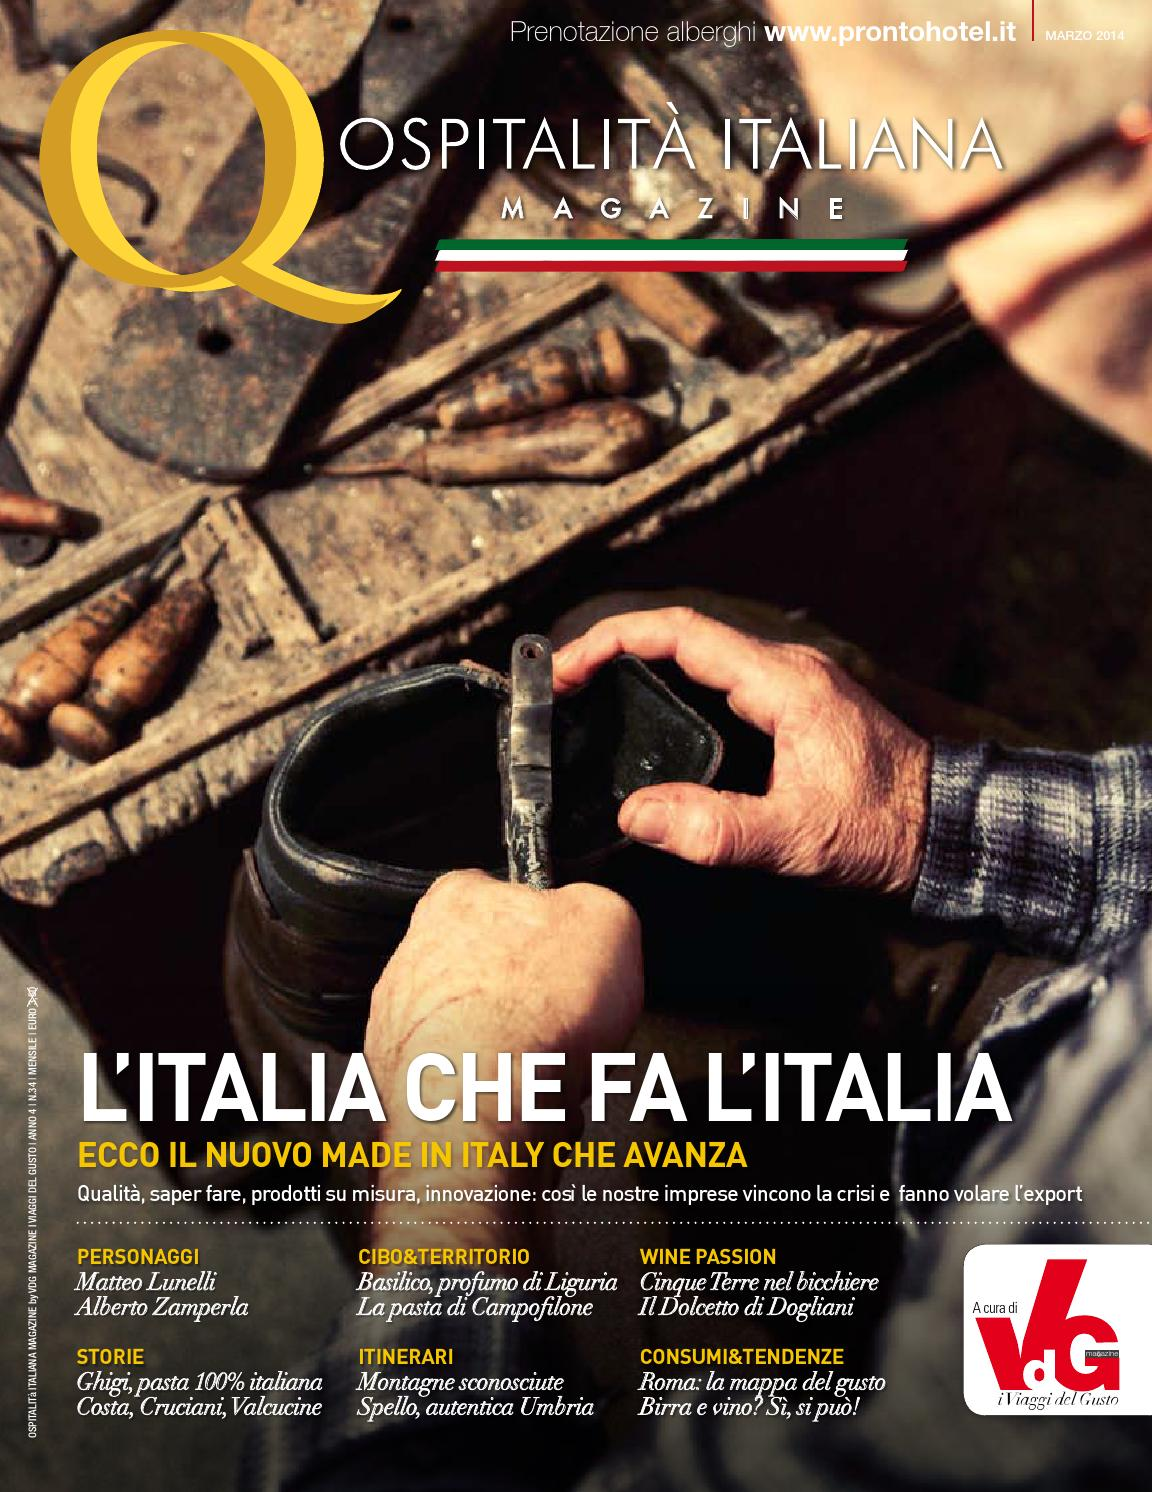 Osp ita marzo 2014 by vdgmagazine - issuu d74f1eabc9d2